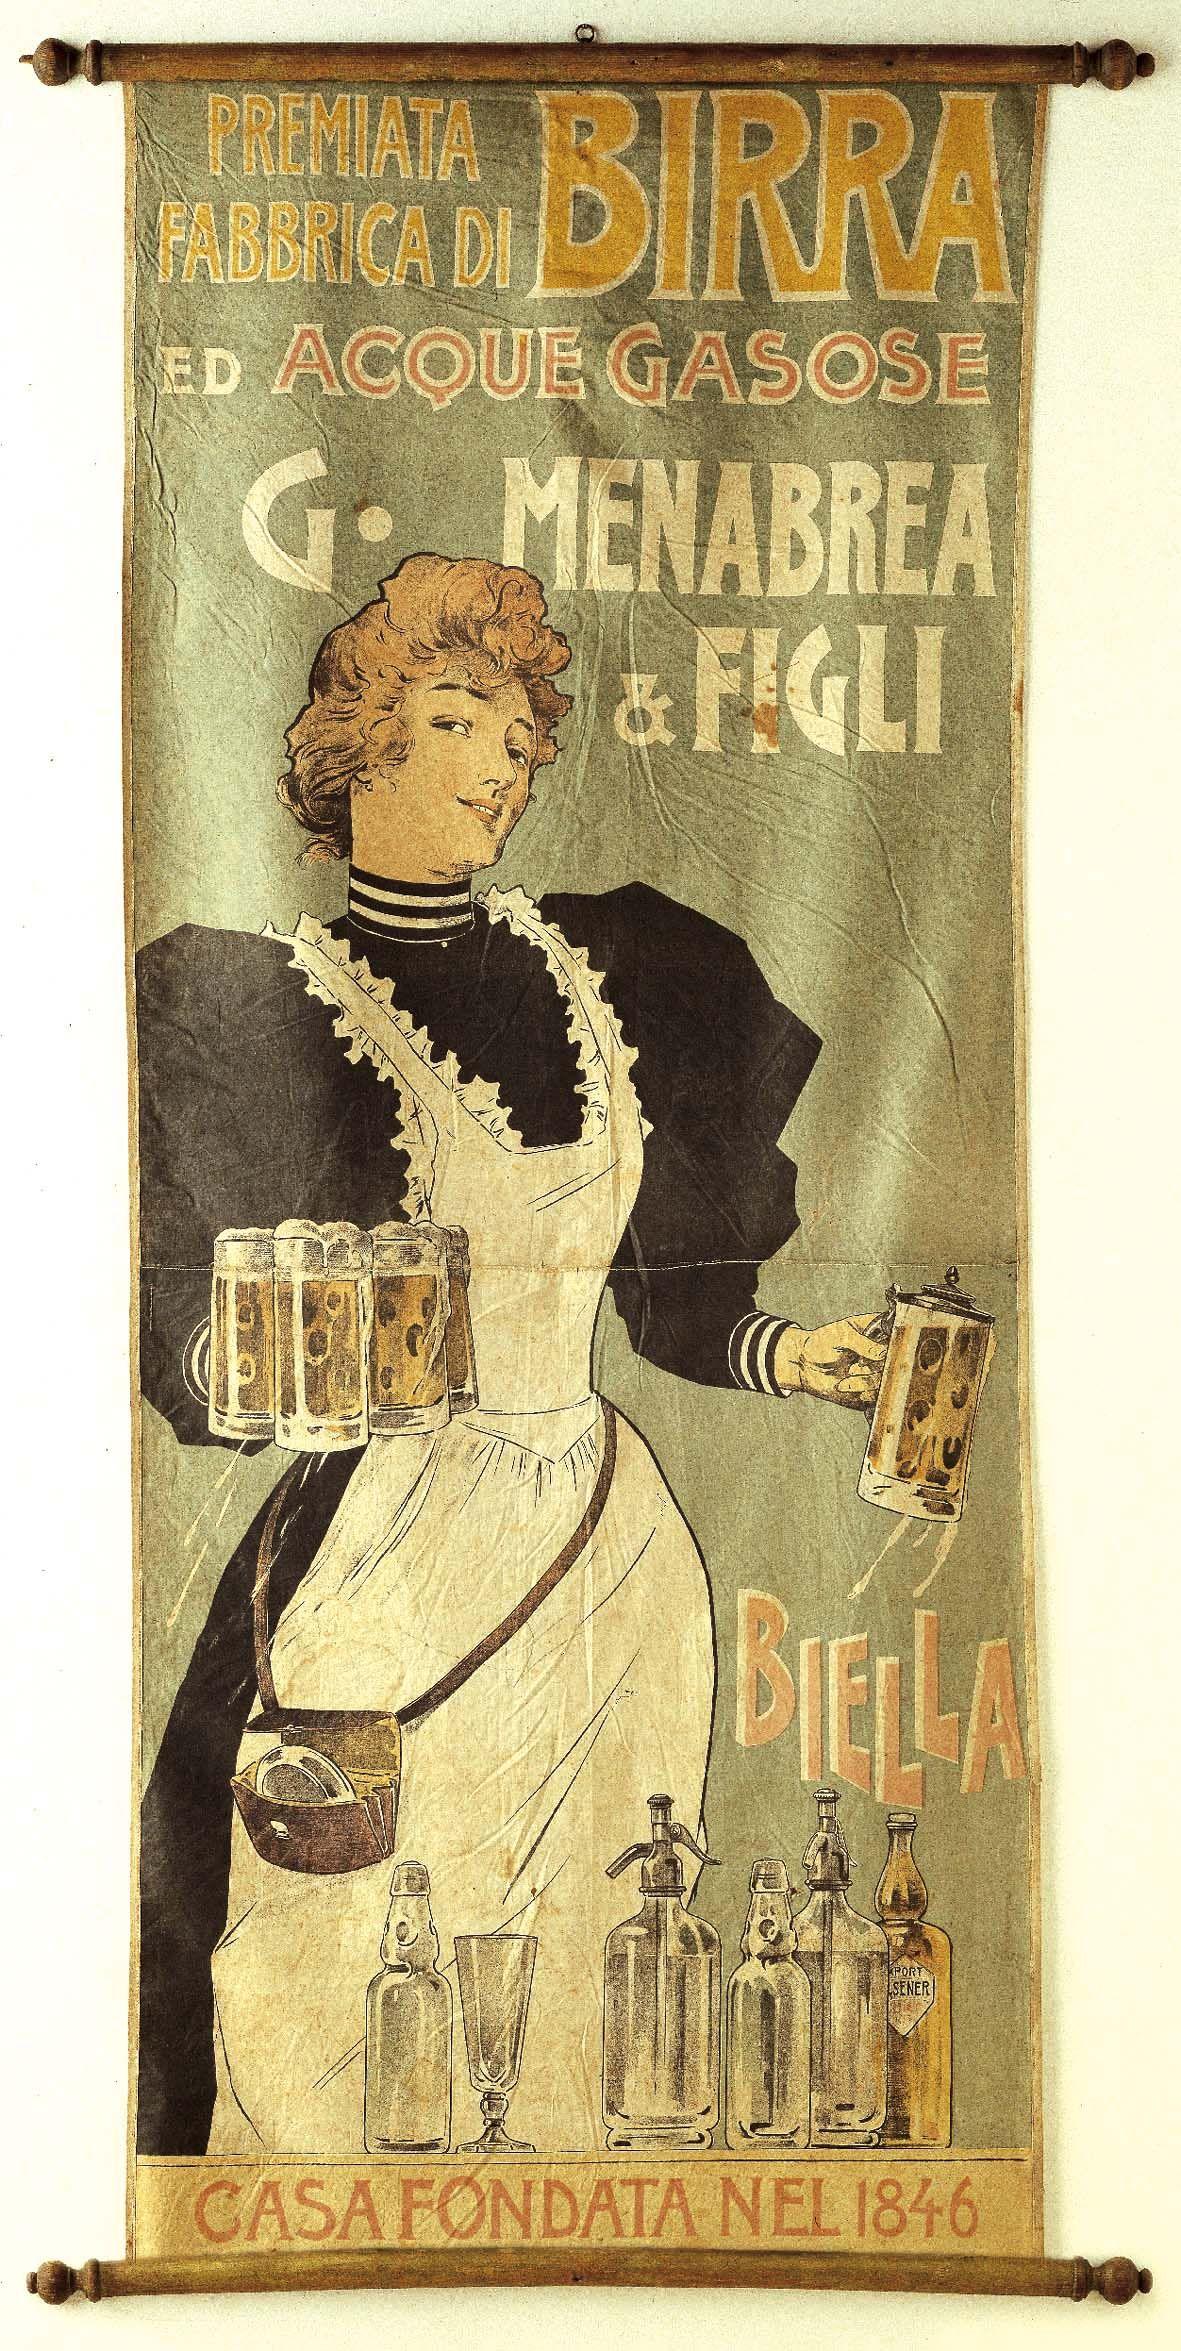 Menabrea | Cartelli Pubblicitari Birra in 2018 | Pinterest ...